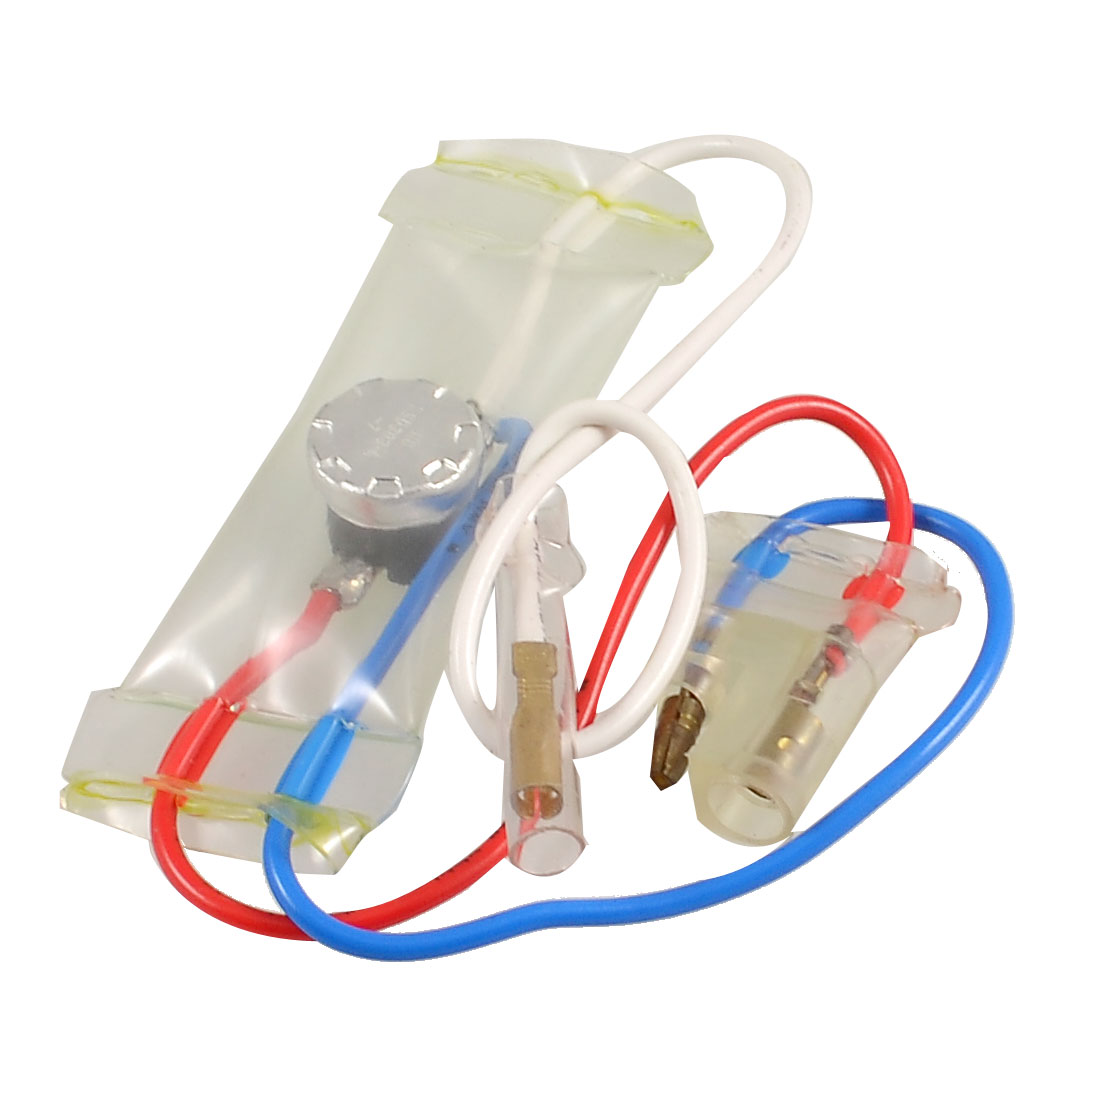 KSD303-A 2 Wires -7C Freezer Defrost Thermostat Switch AC 250V 10A